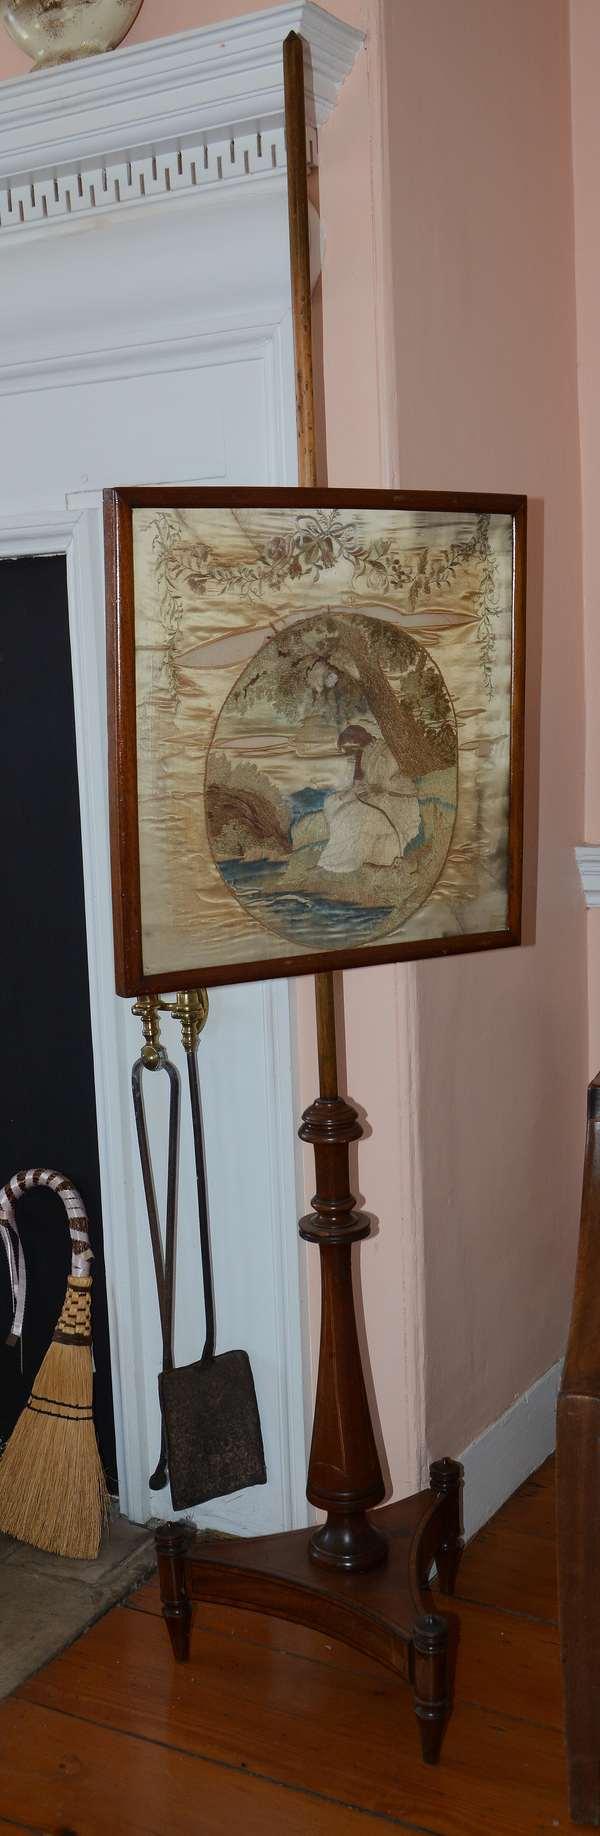 19th C. English mahogany pole screen with good needle work (43)